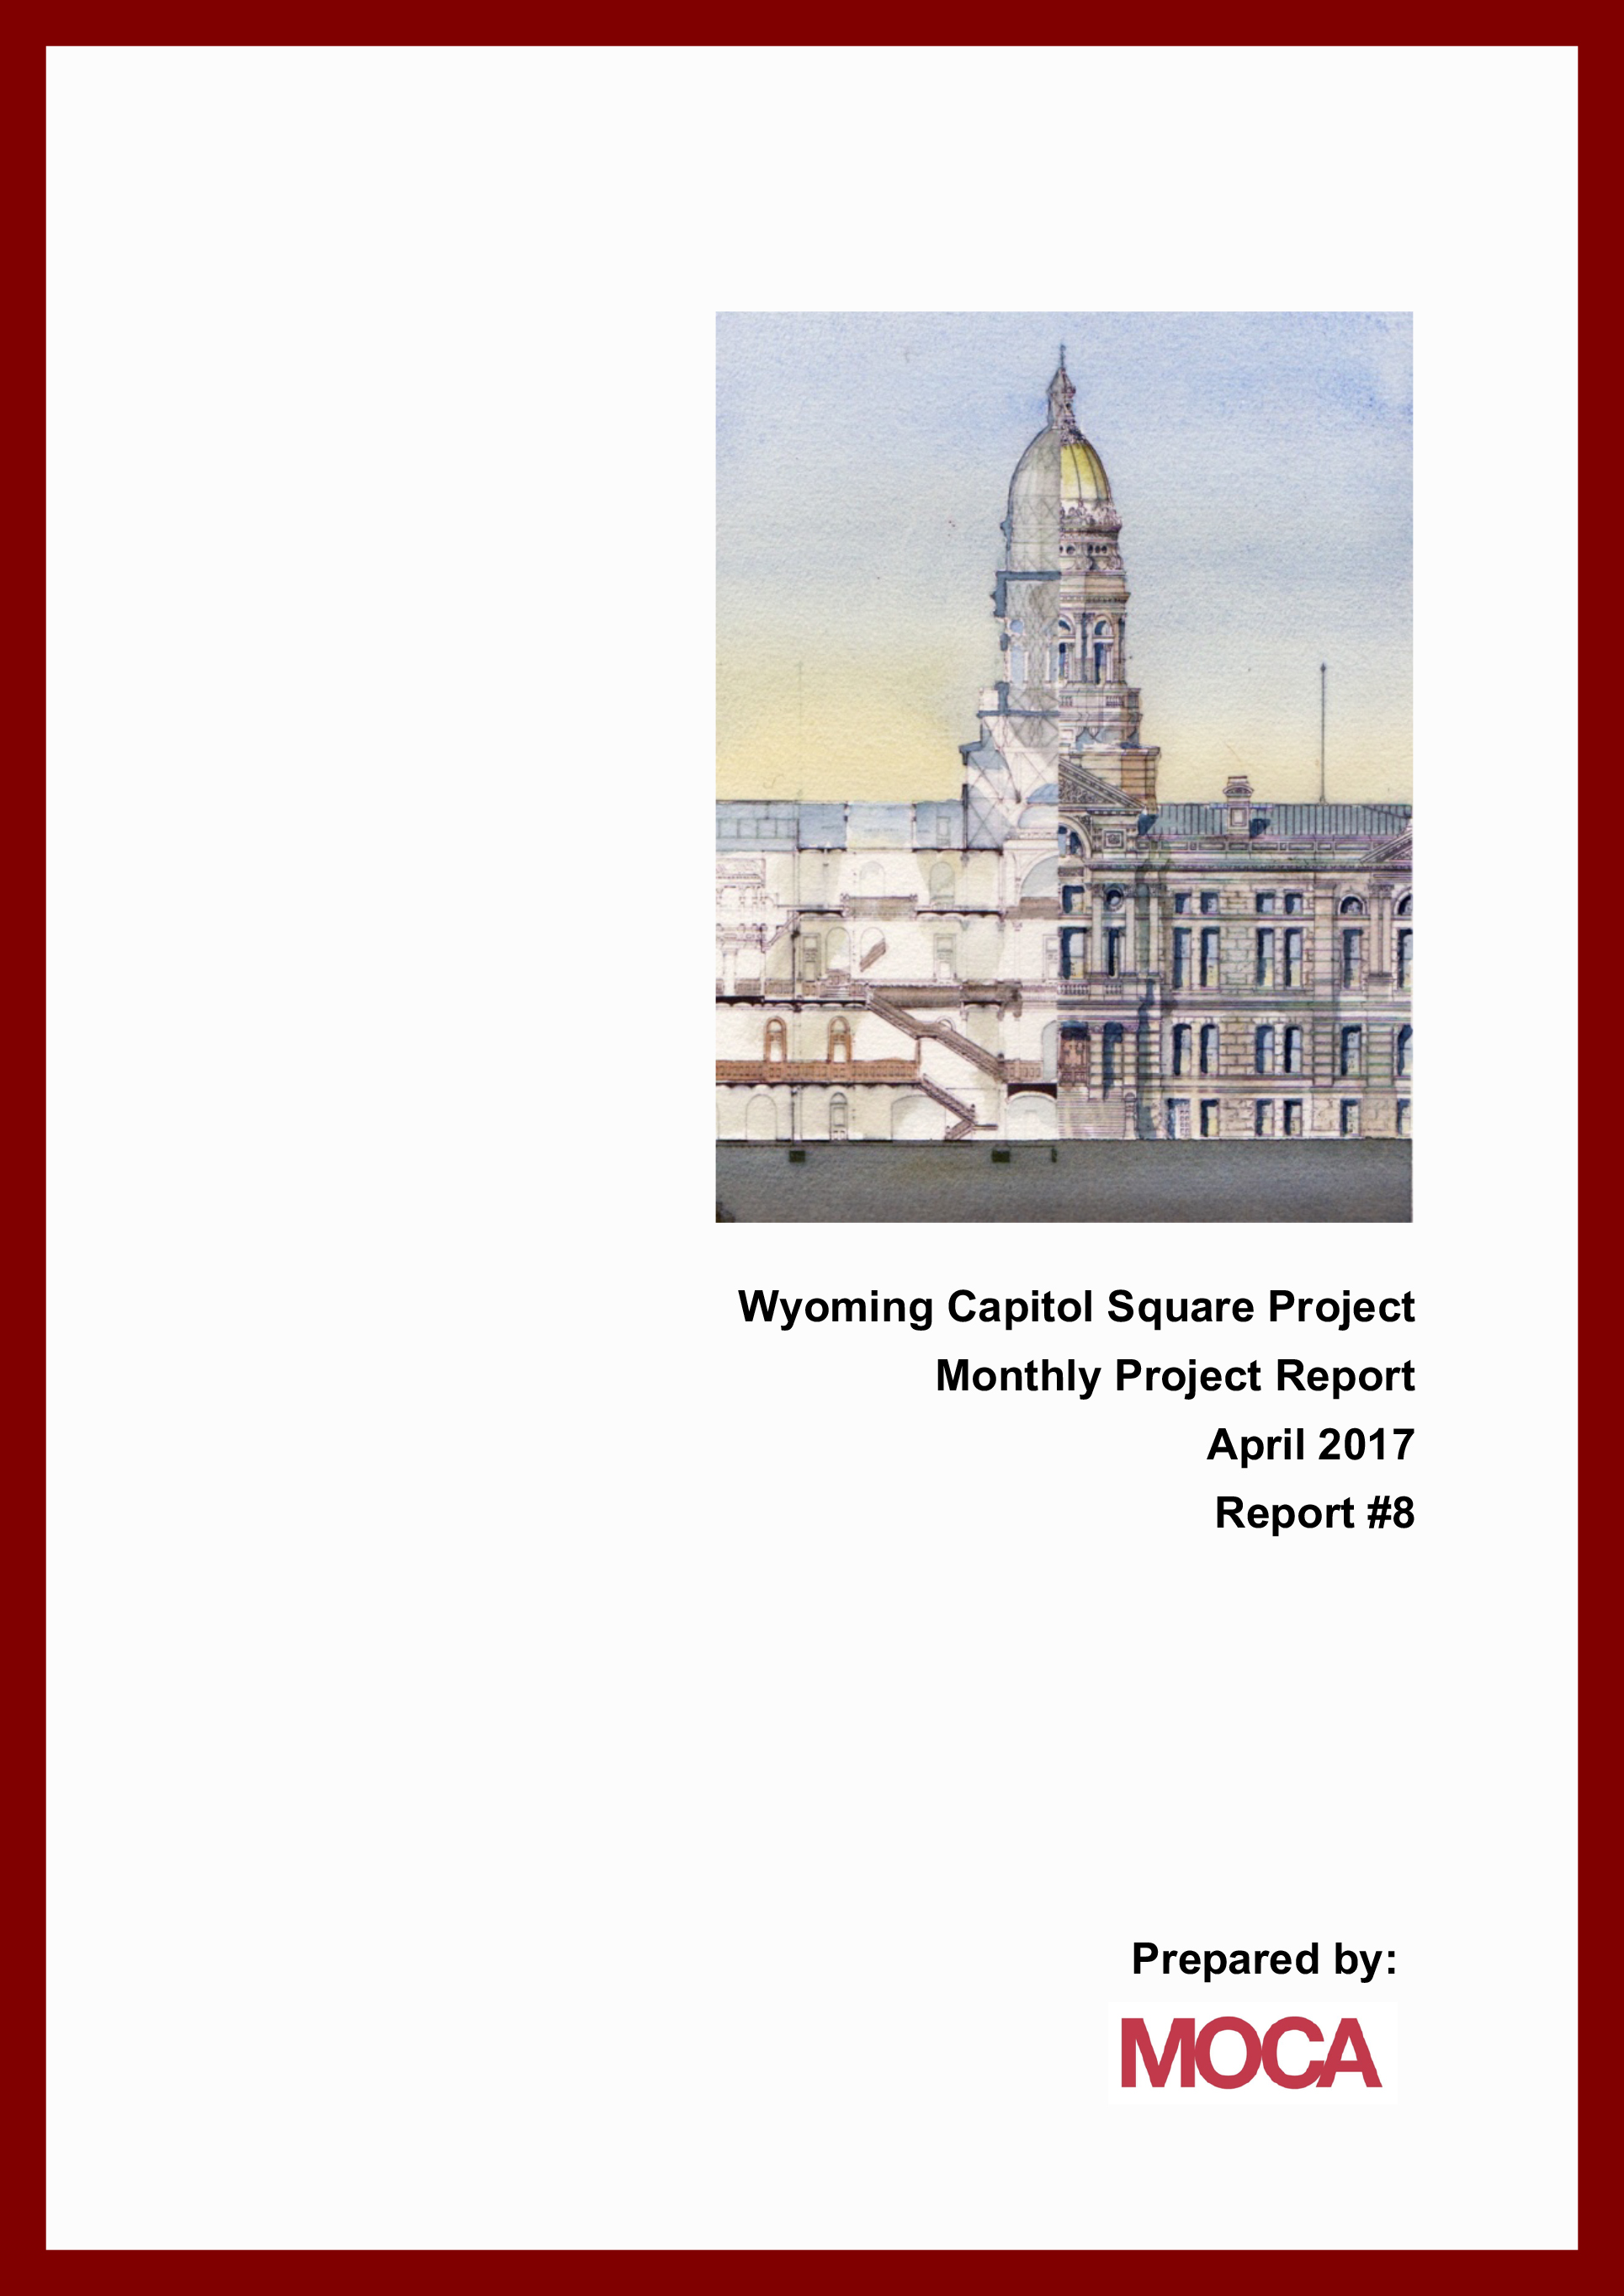 2017-0602-WyomingCapitolMonthlyReport-Final-8.jpg